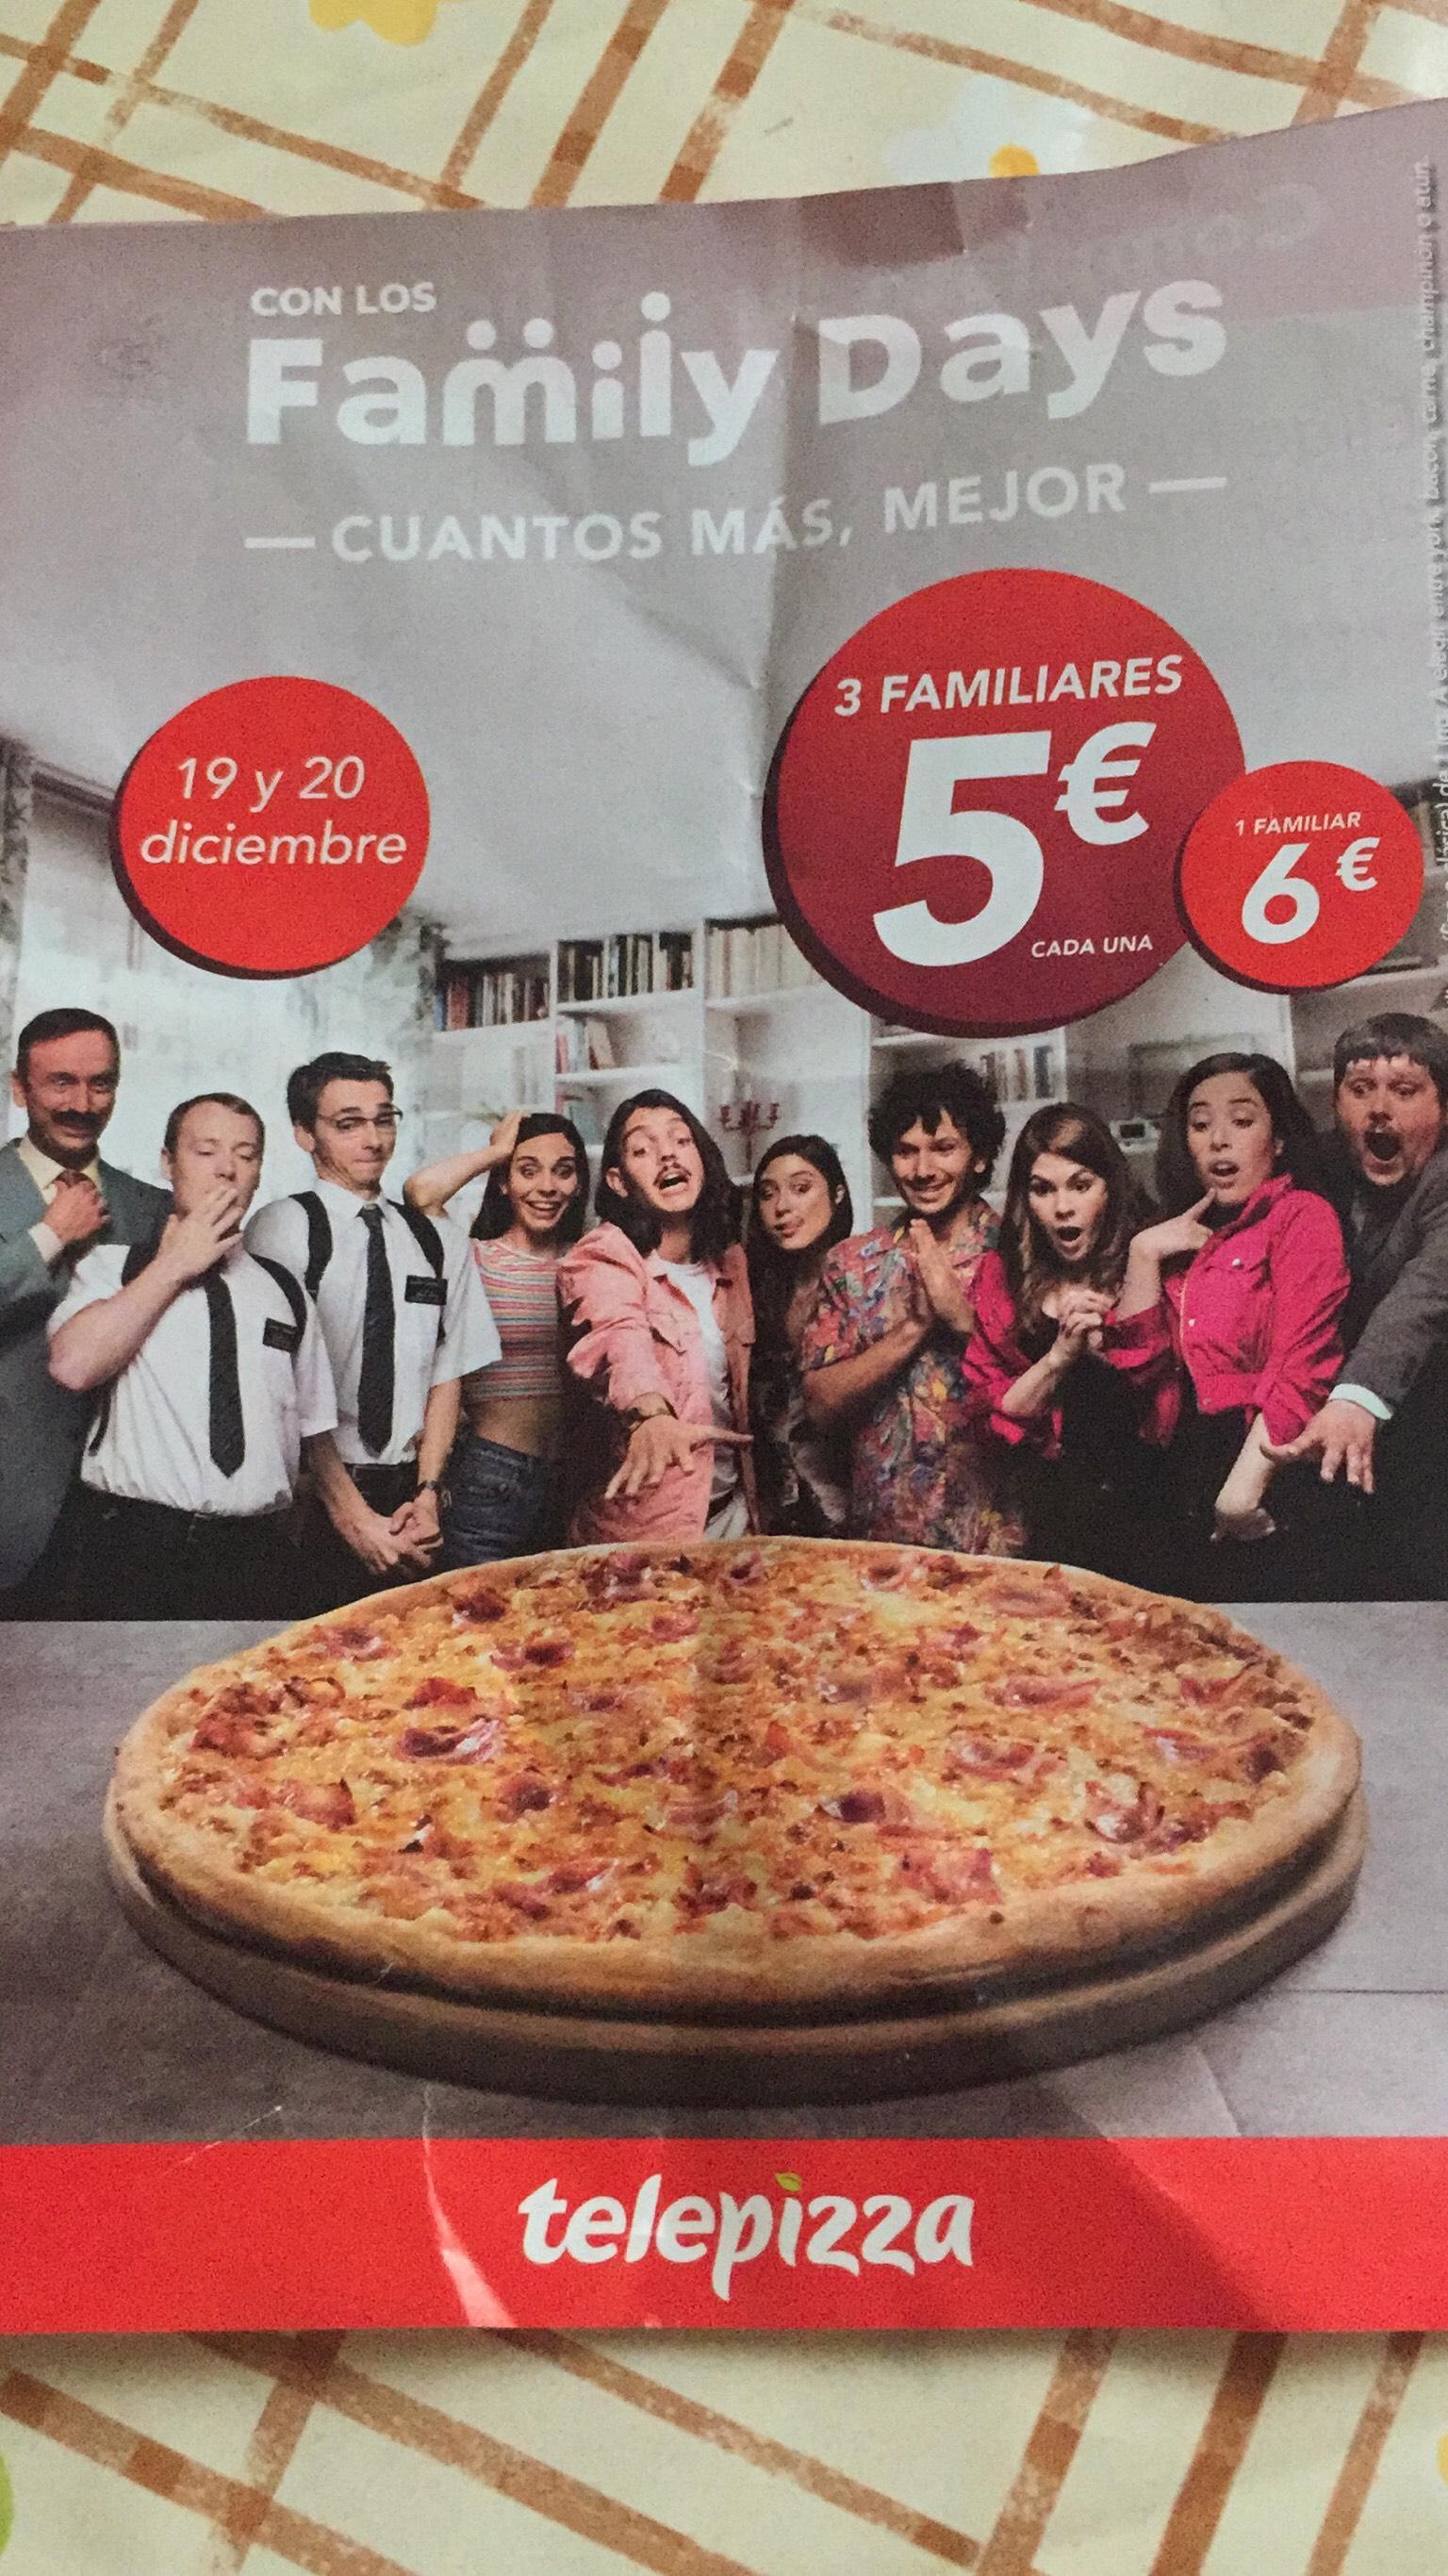 3 pizzas familiares 5€ cada una (A RECOGER)